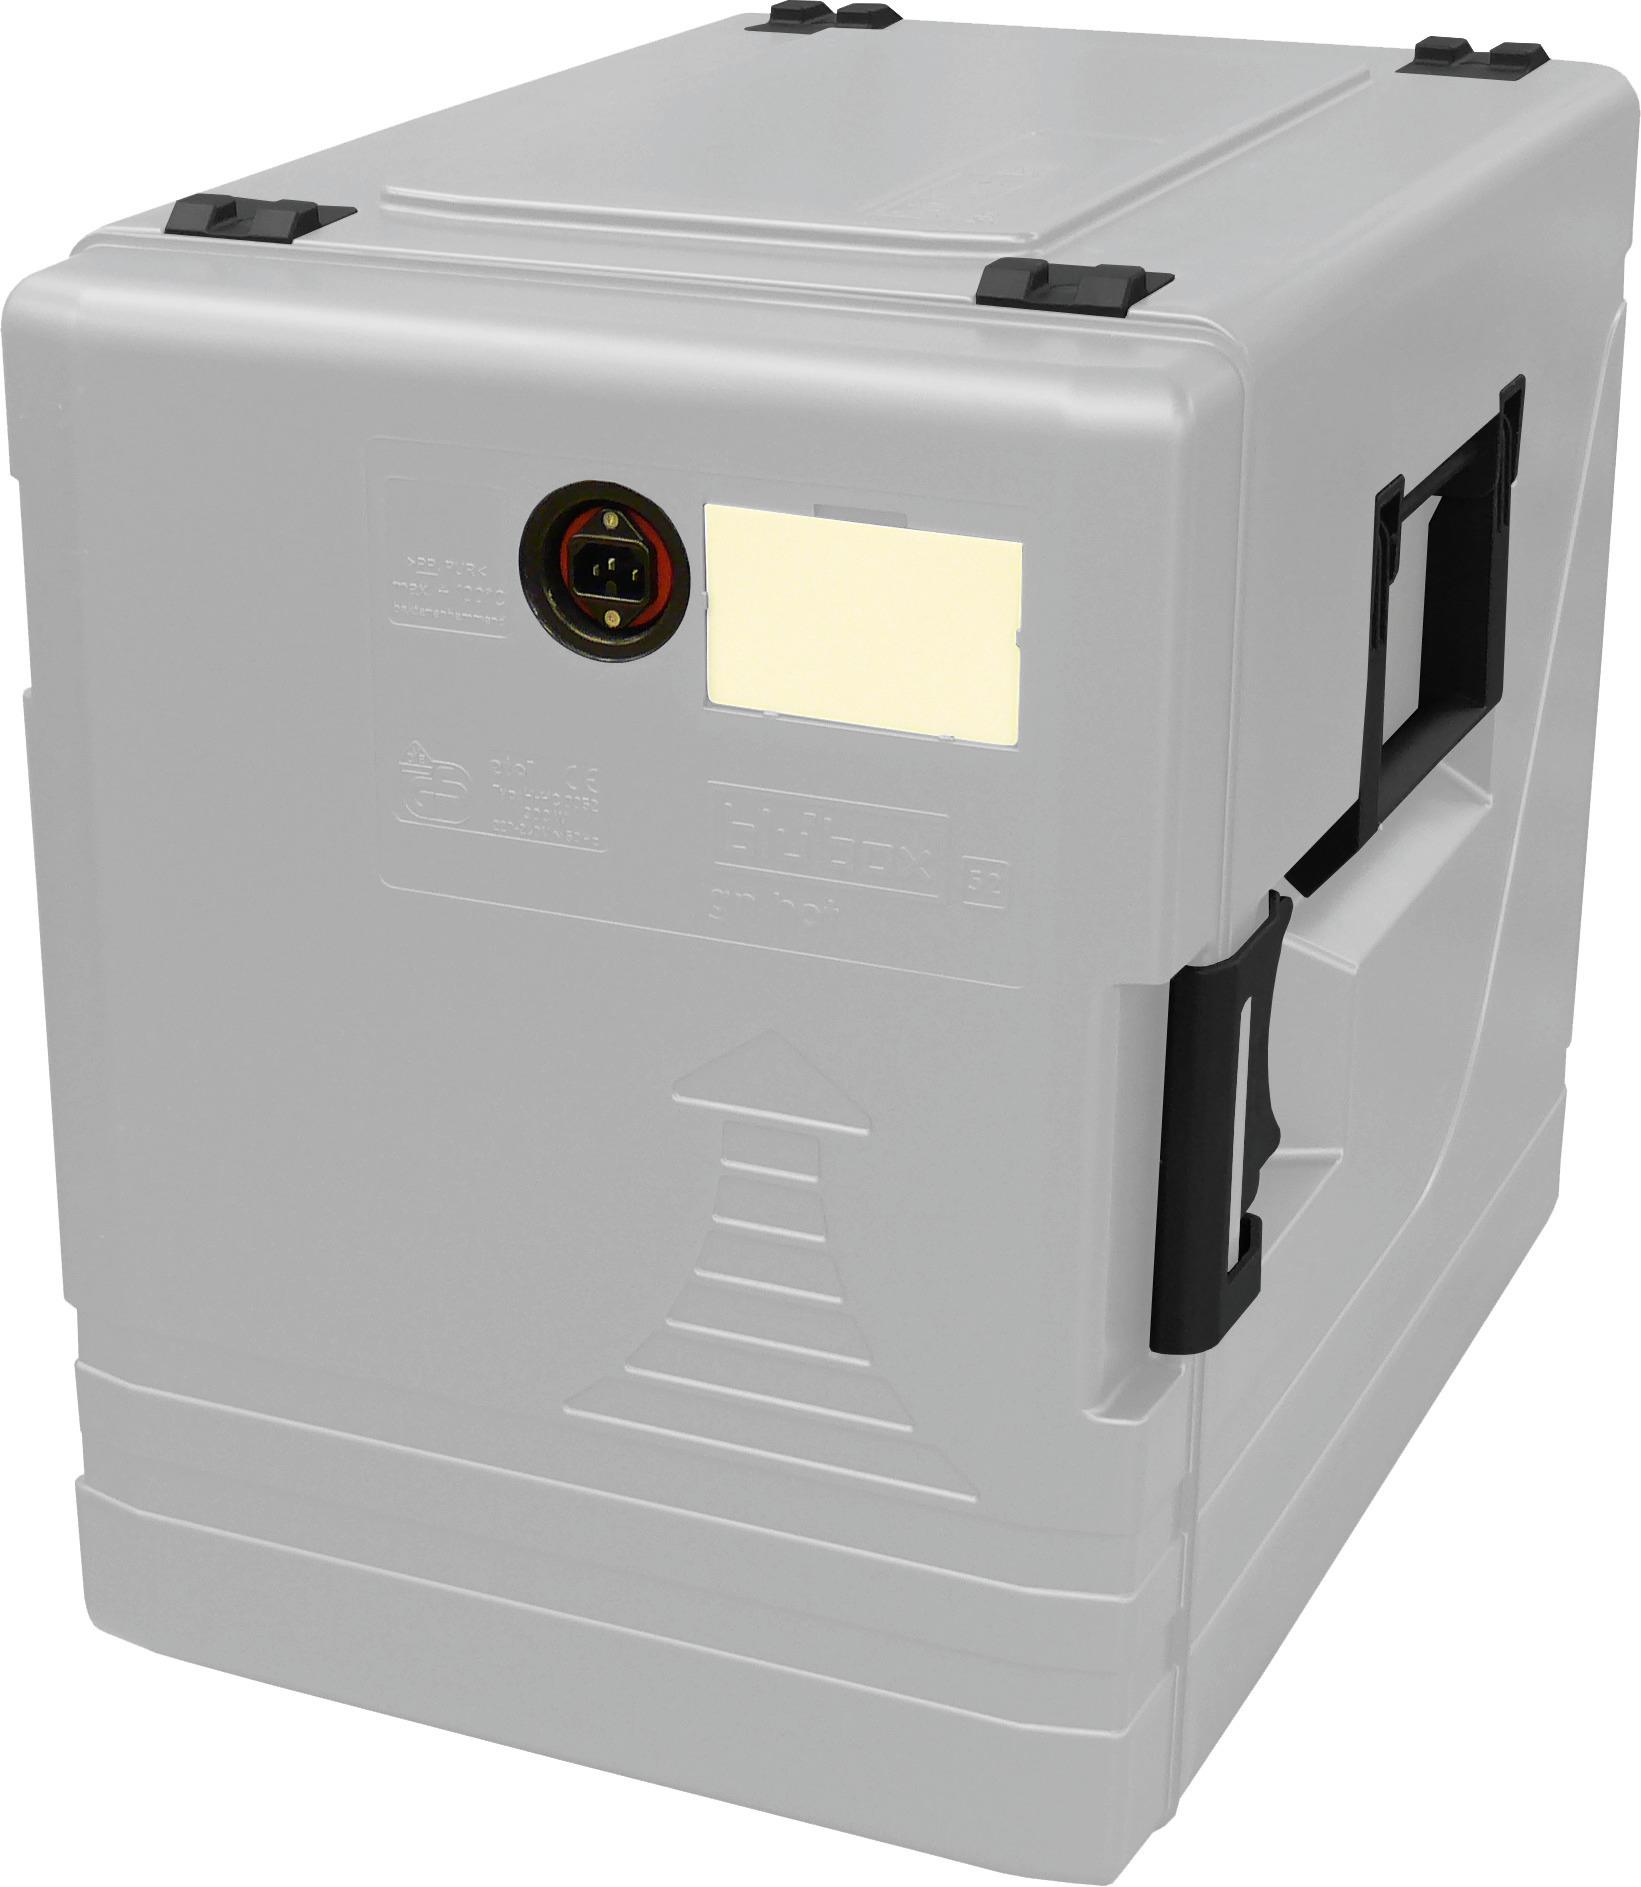 Transportbehälter 52 l beheizt lichtgrau 639 x 446 x 560 mm